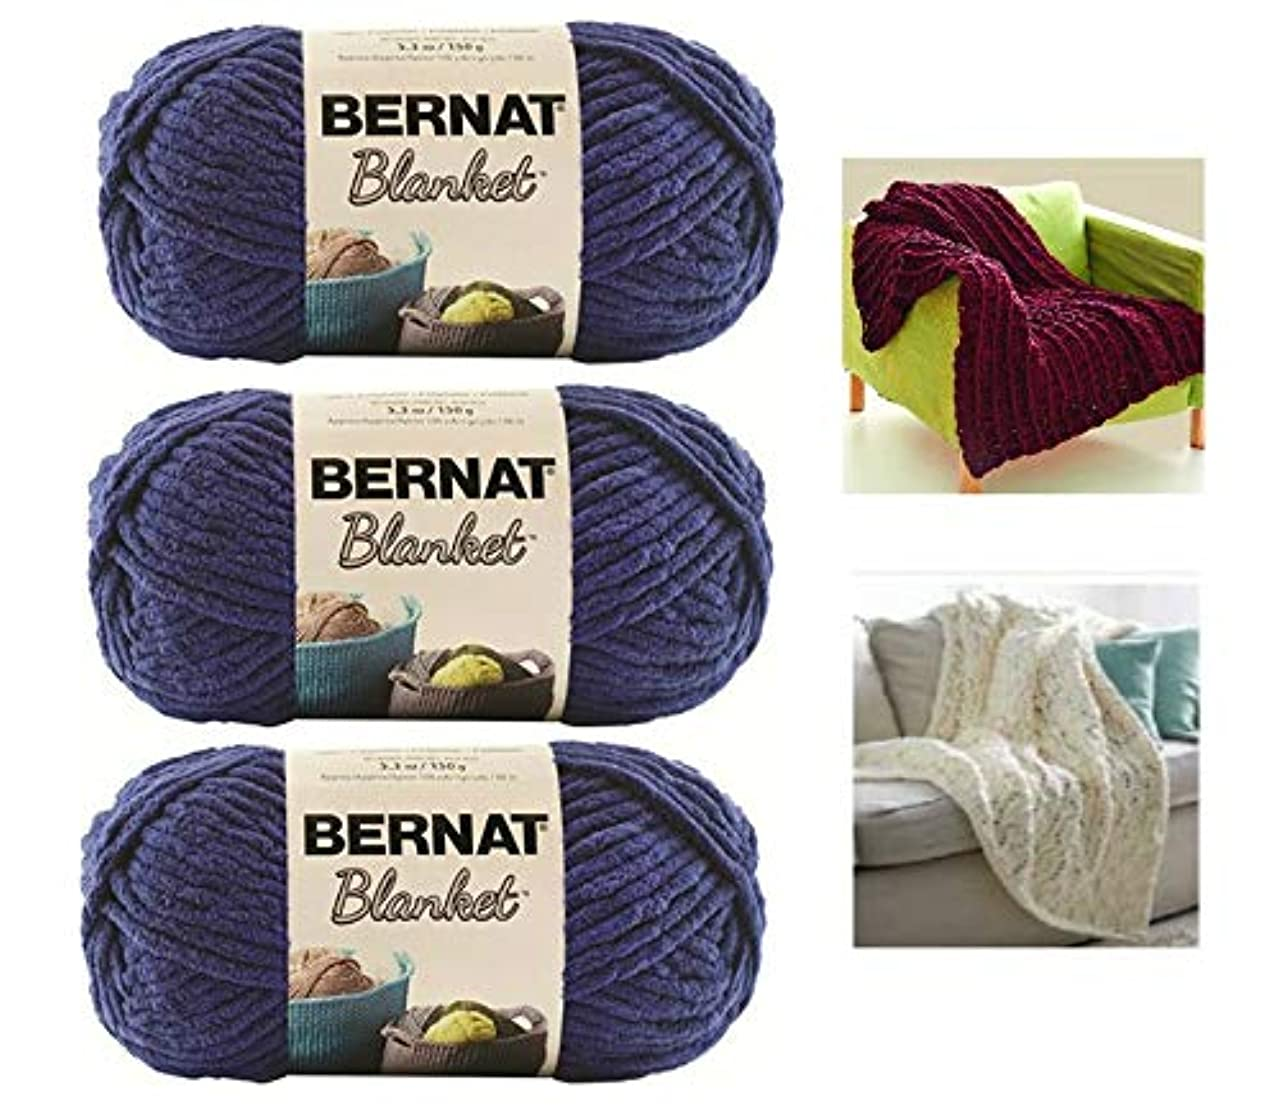 Bernat Blanket Yarn - 3 Pack Bundle with 2 Patterns - Navy